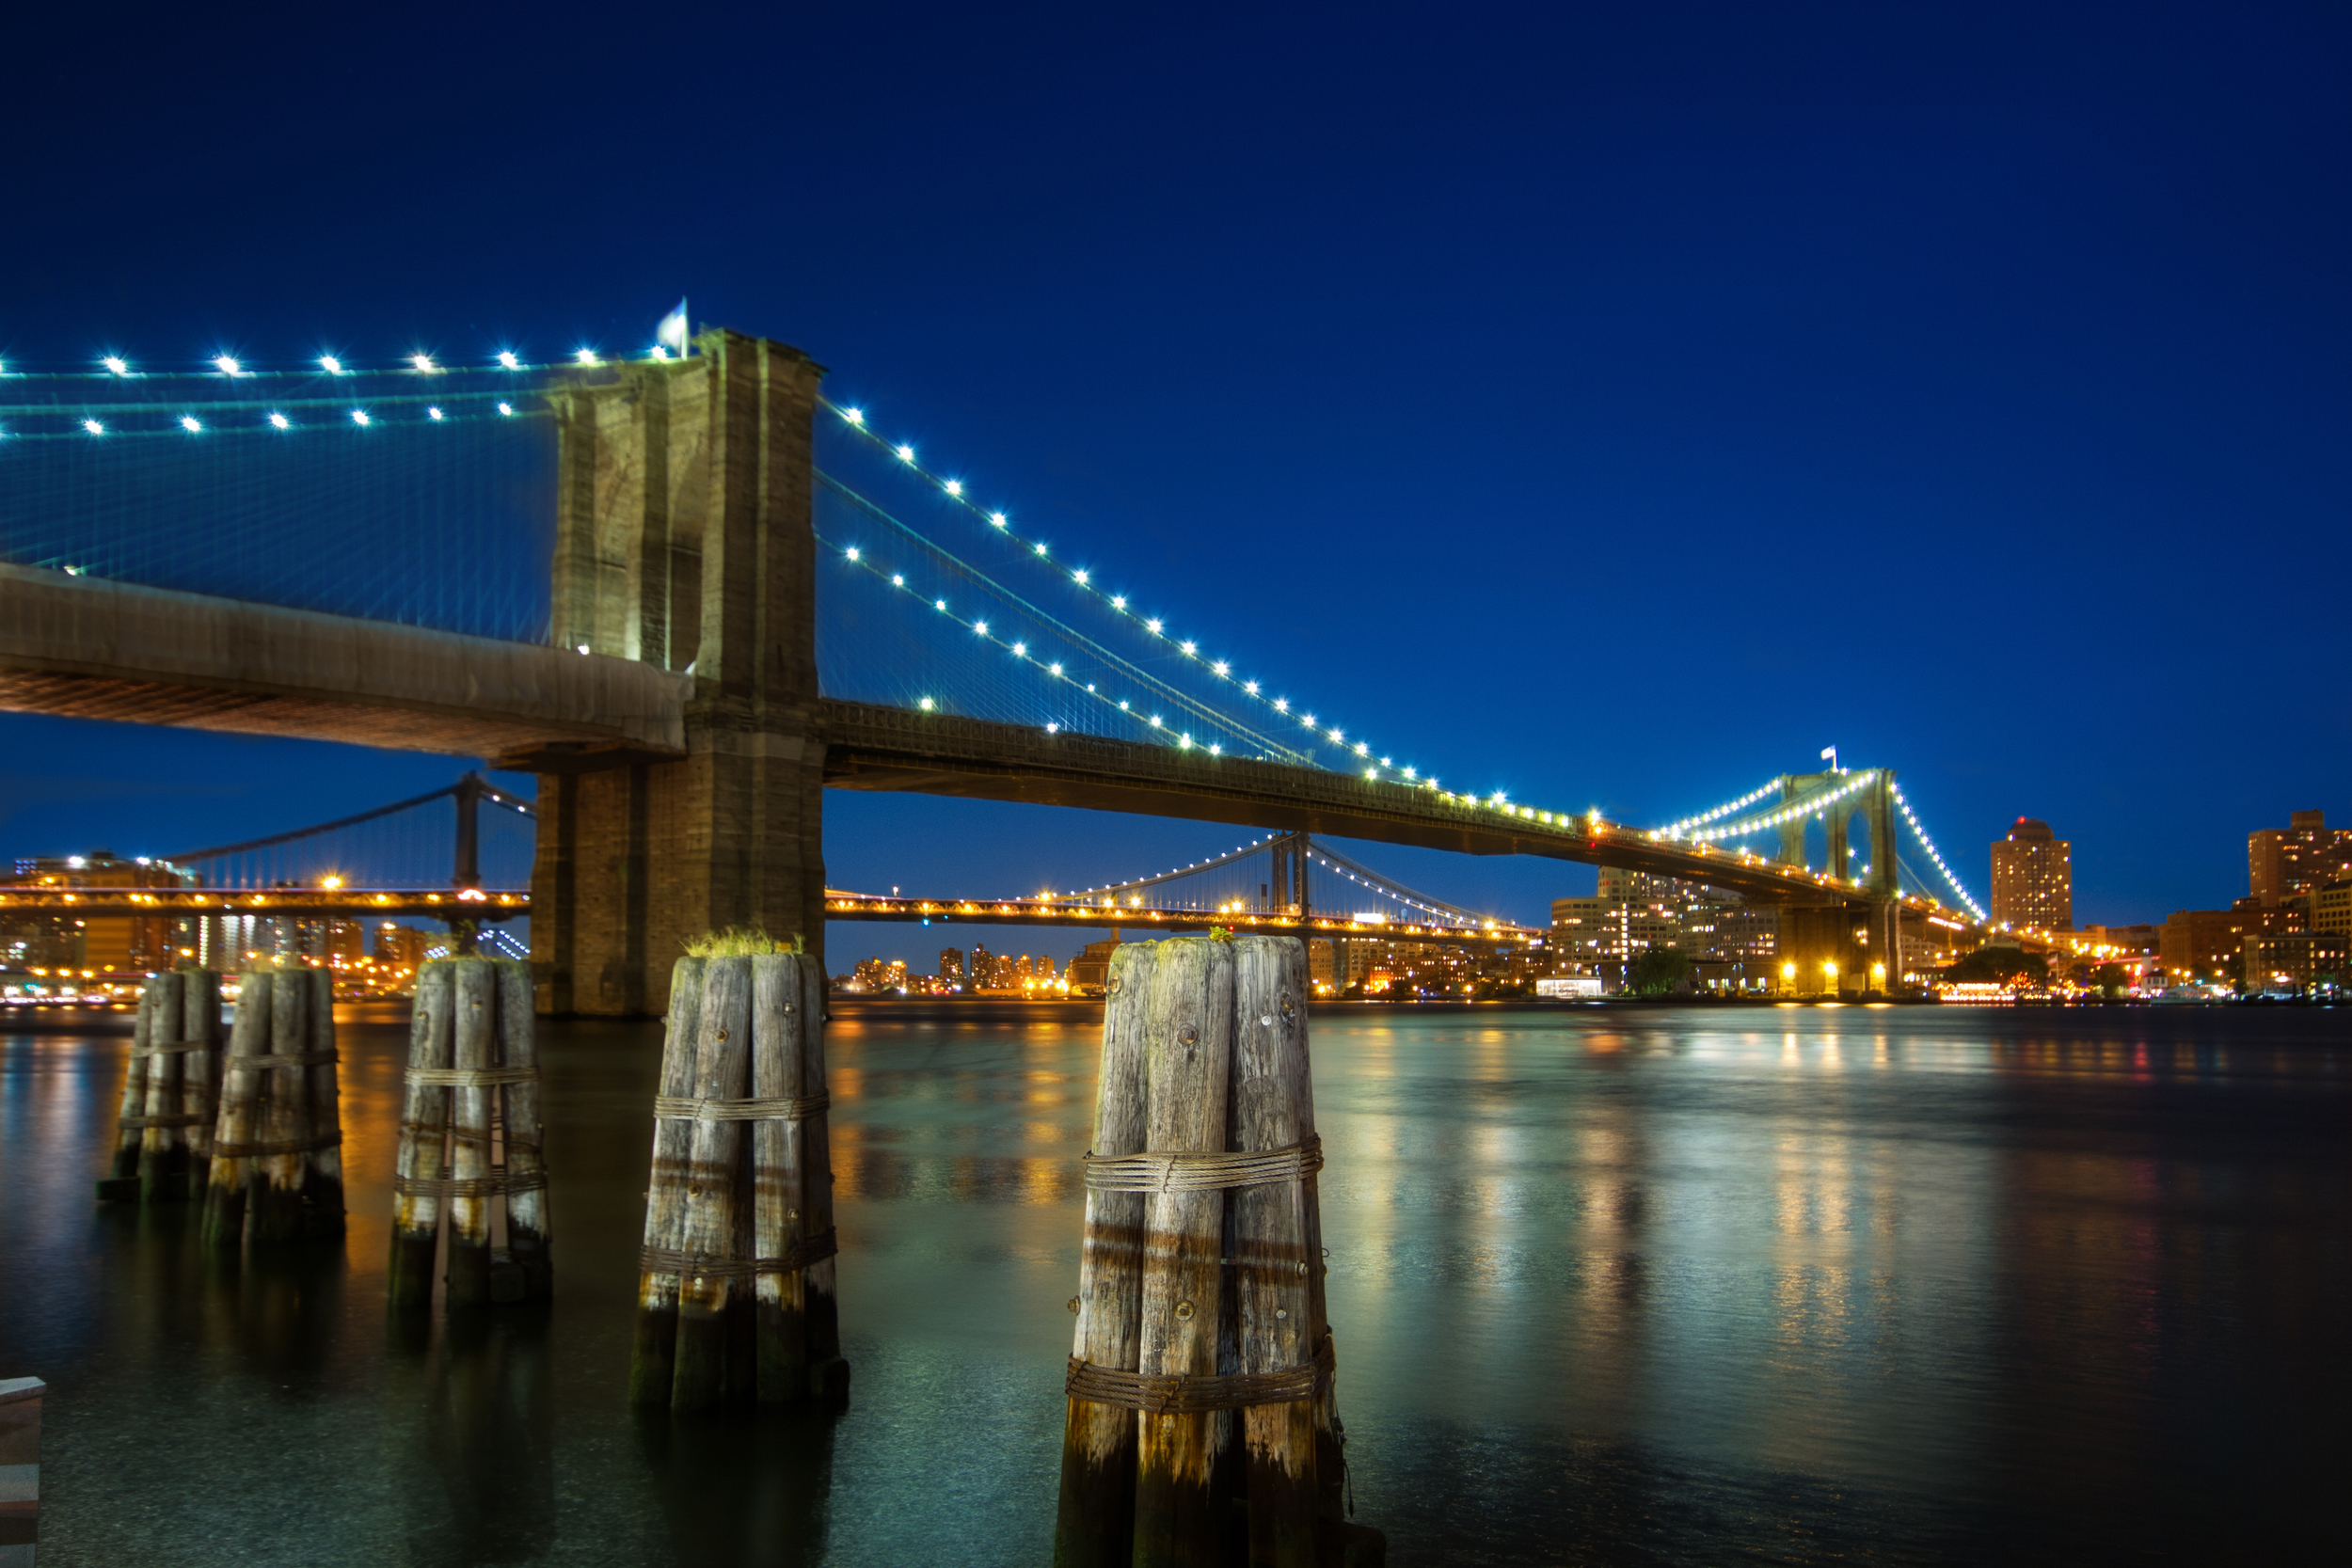 Brooklyn Bridge at Night  Framed - 12x18  Unframed - 8x12